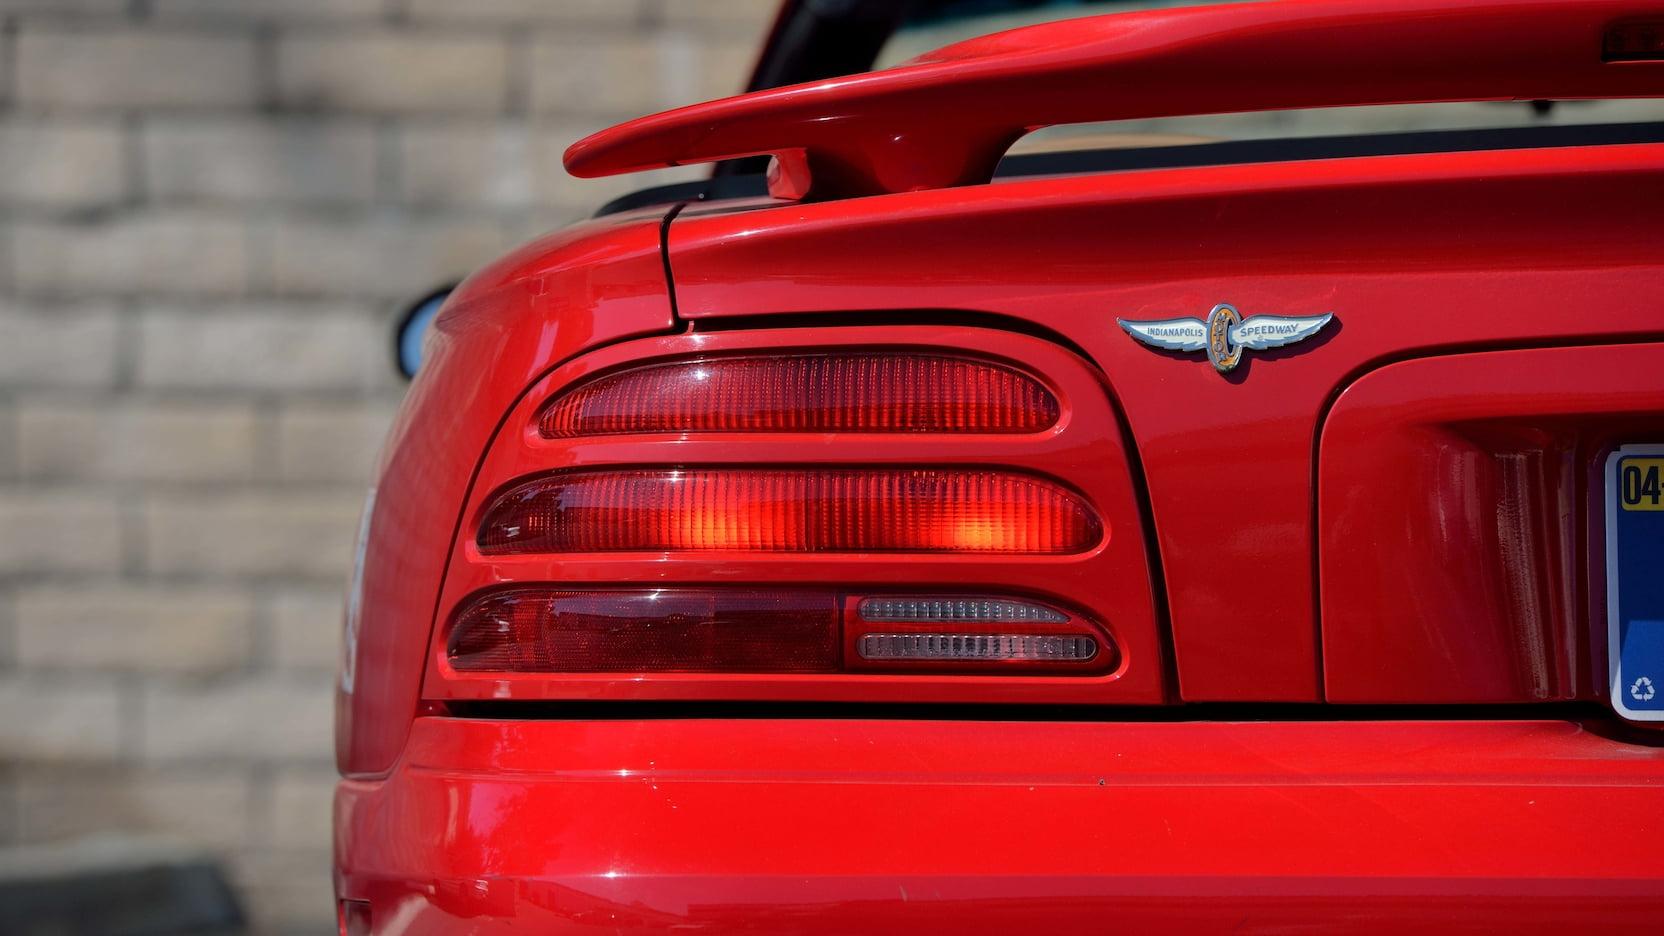 1994 Ford Mustang SVT Cobra Pace Car Edition Parnelli Jones Mecum